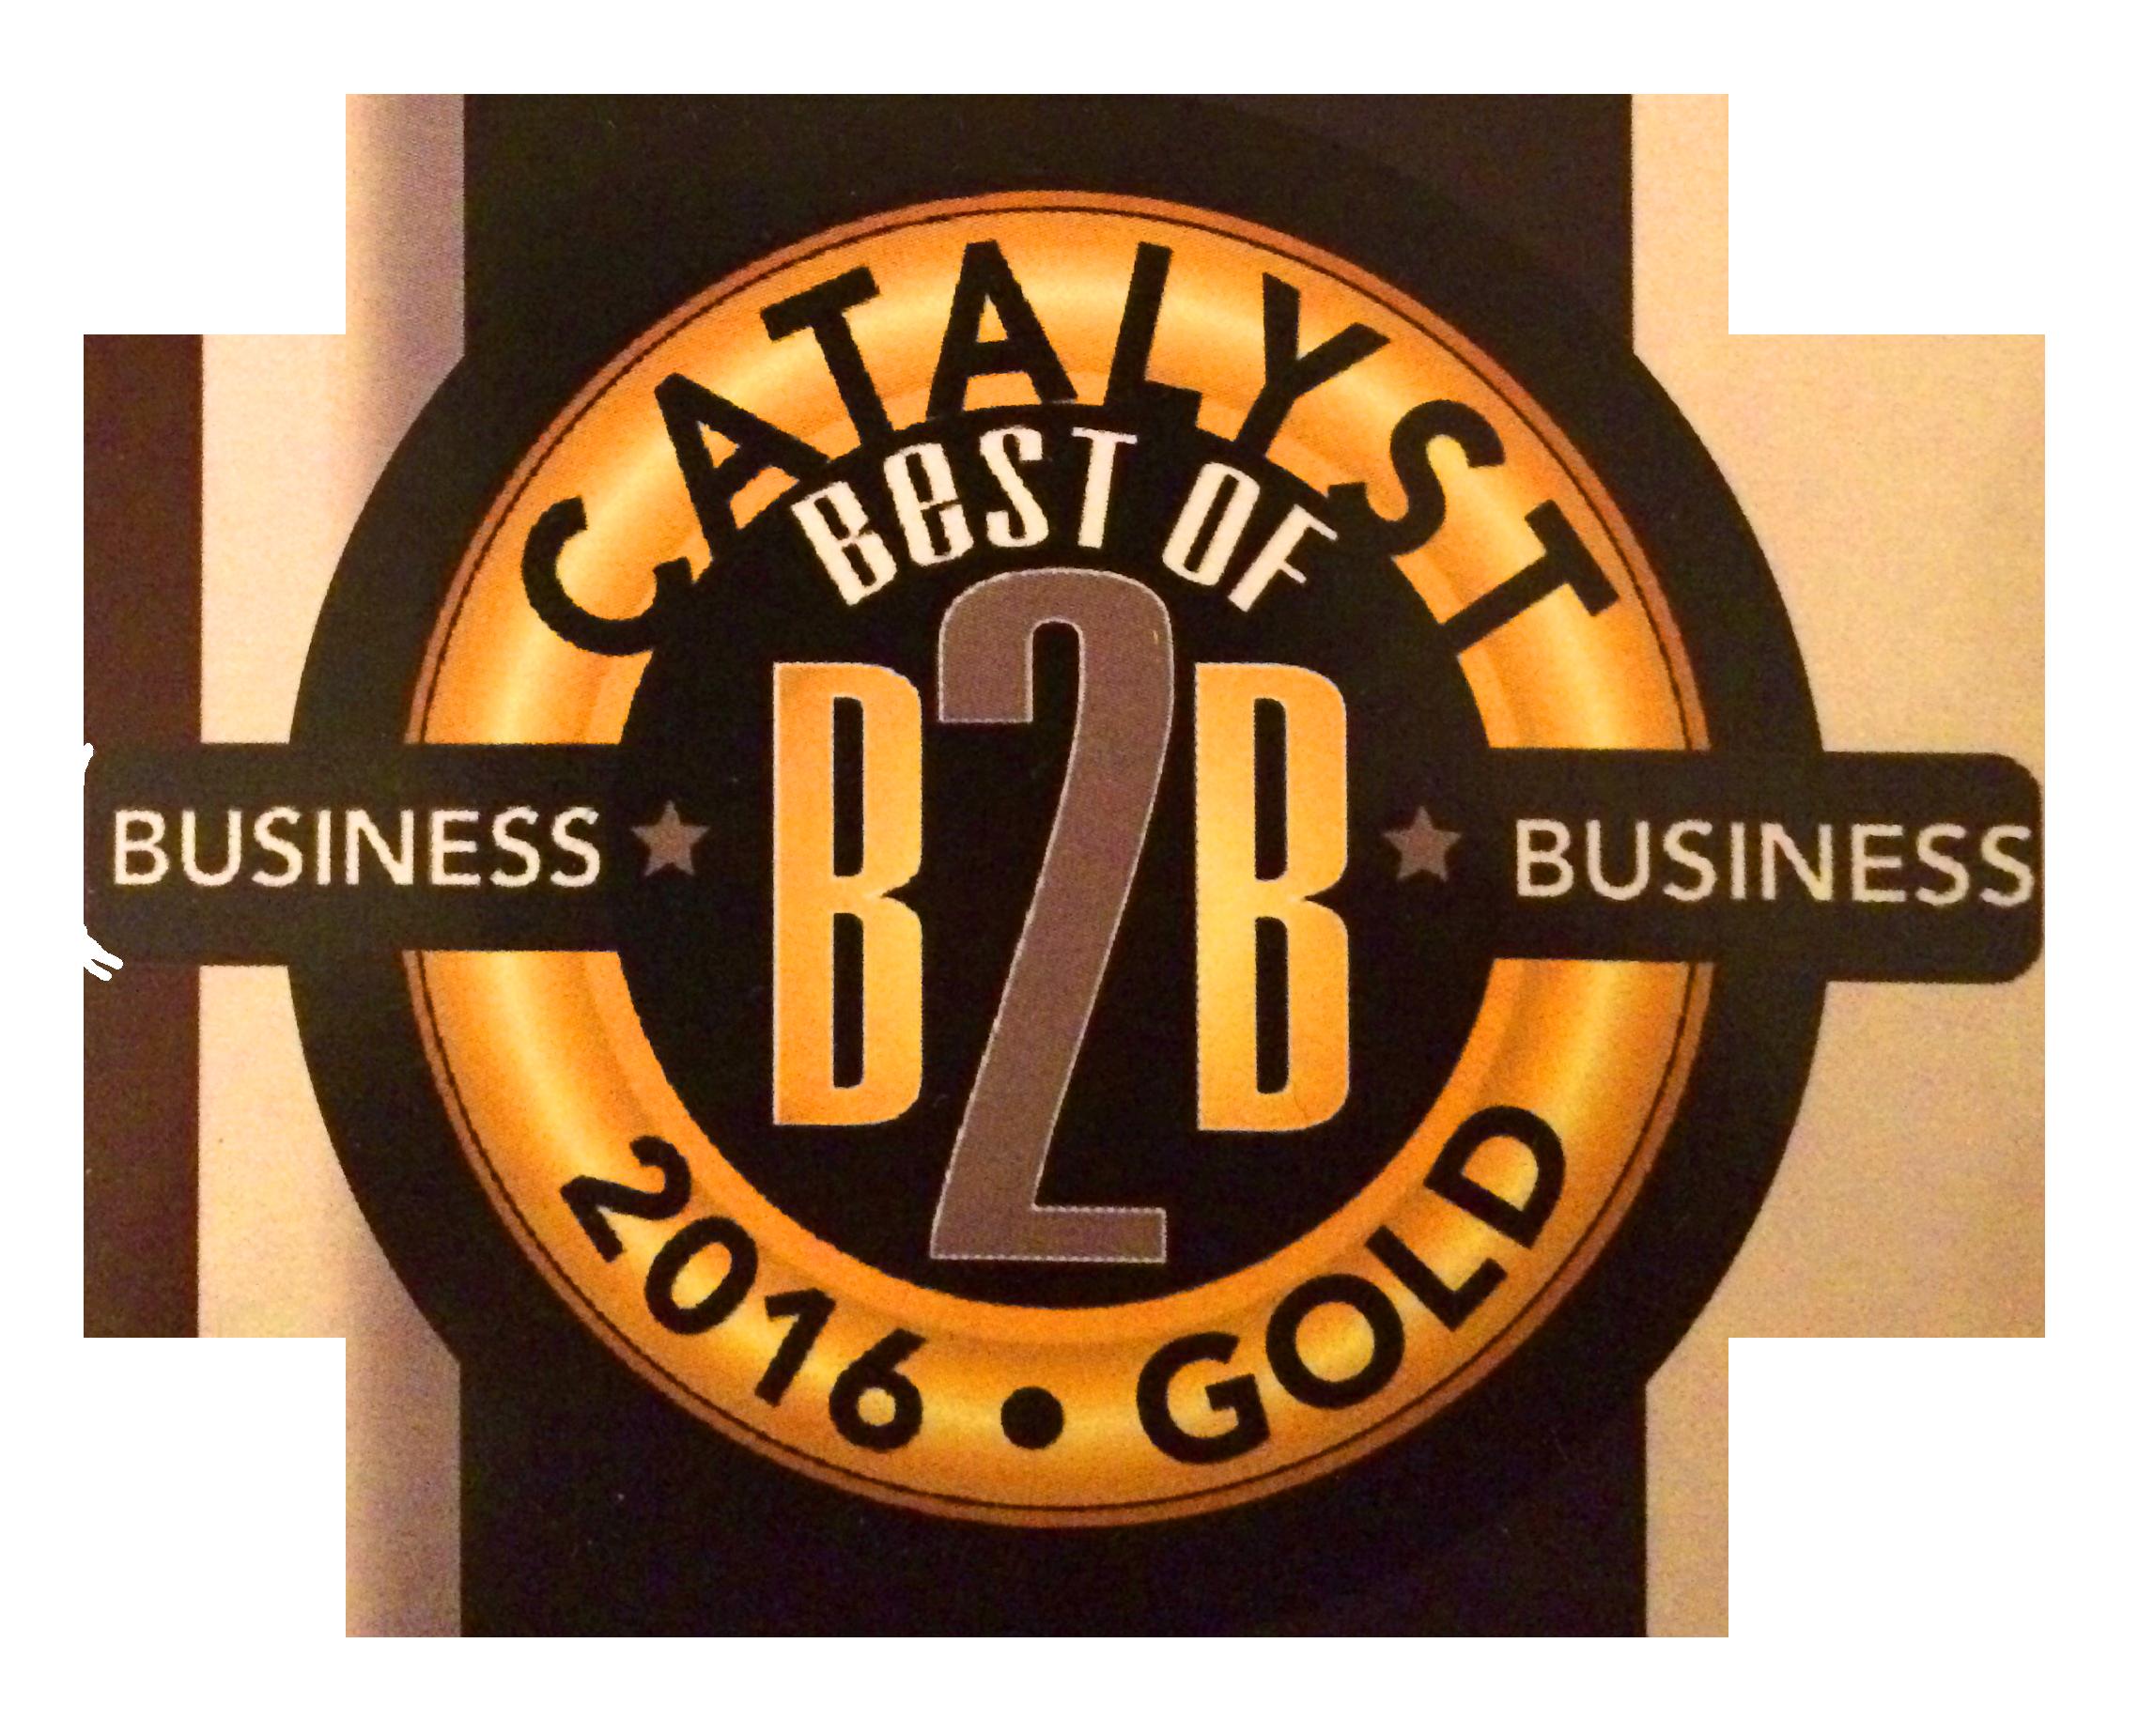 Best of B2B 2016 GOLD